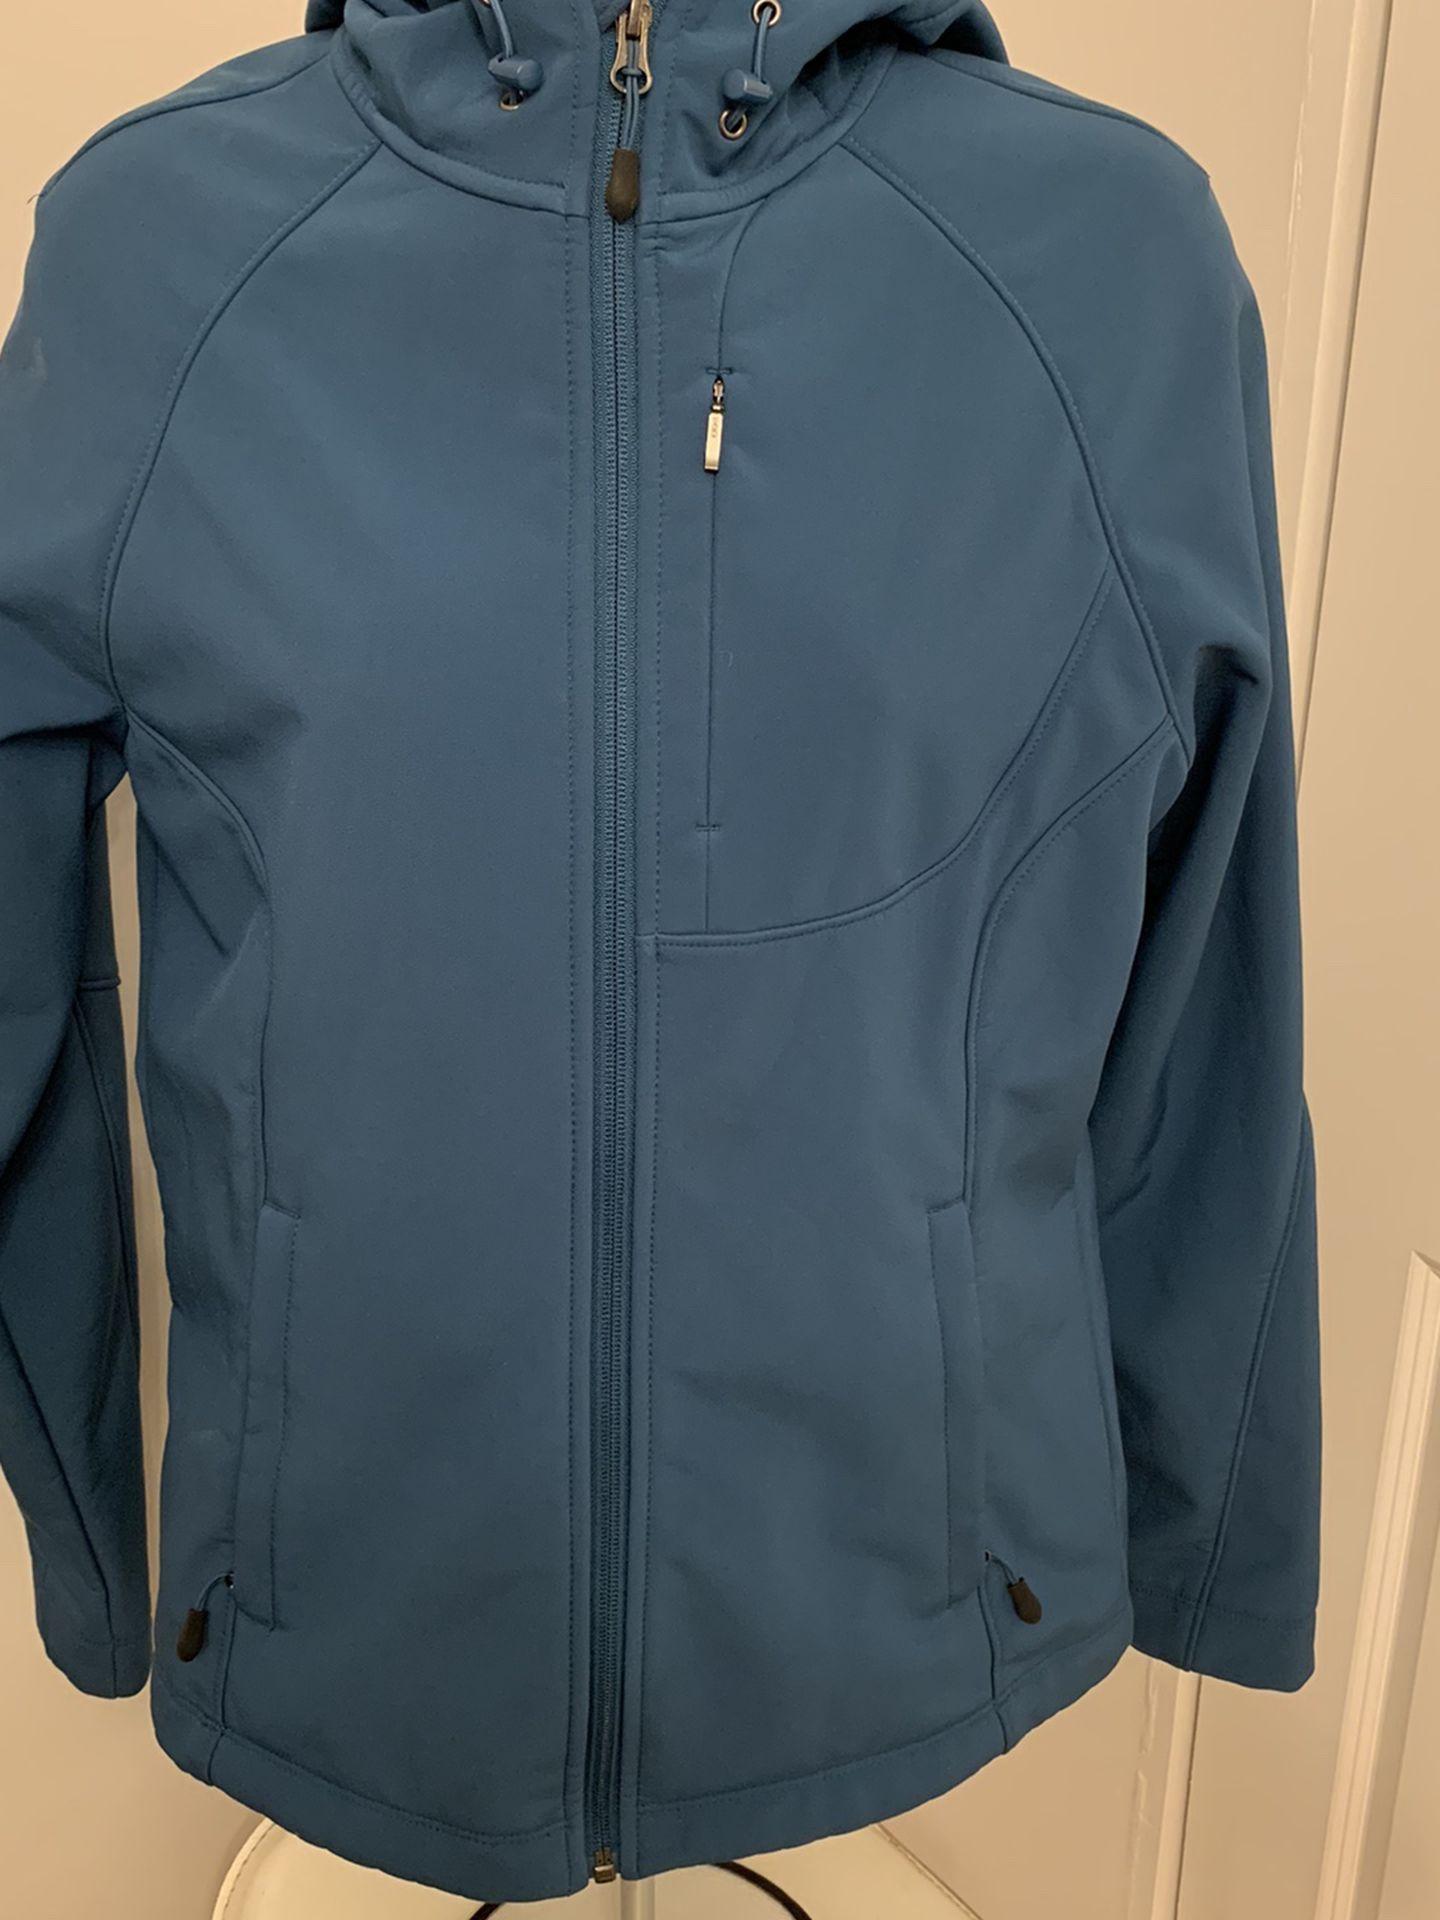 Women's Small Jacket